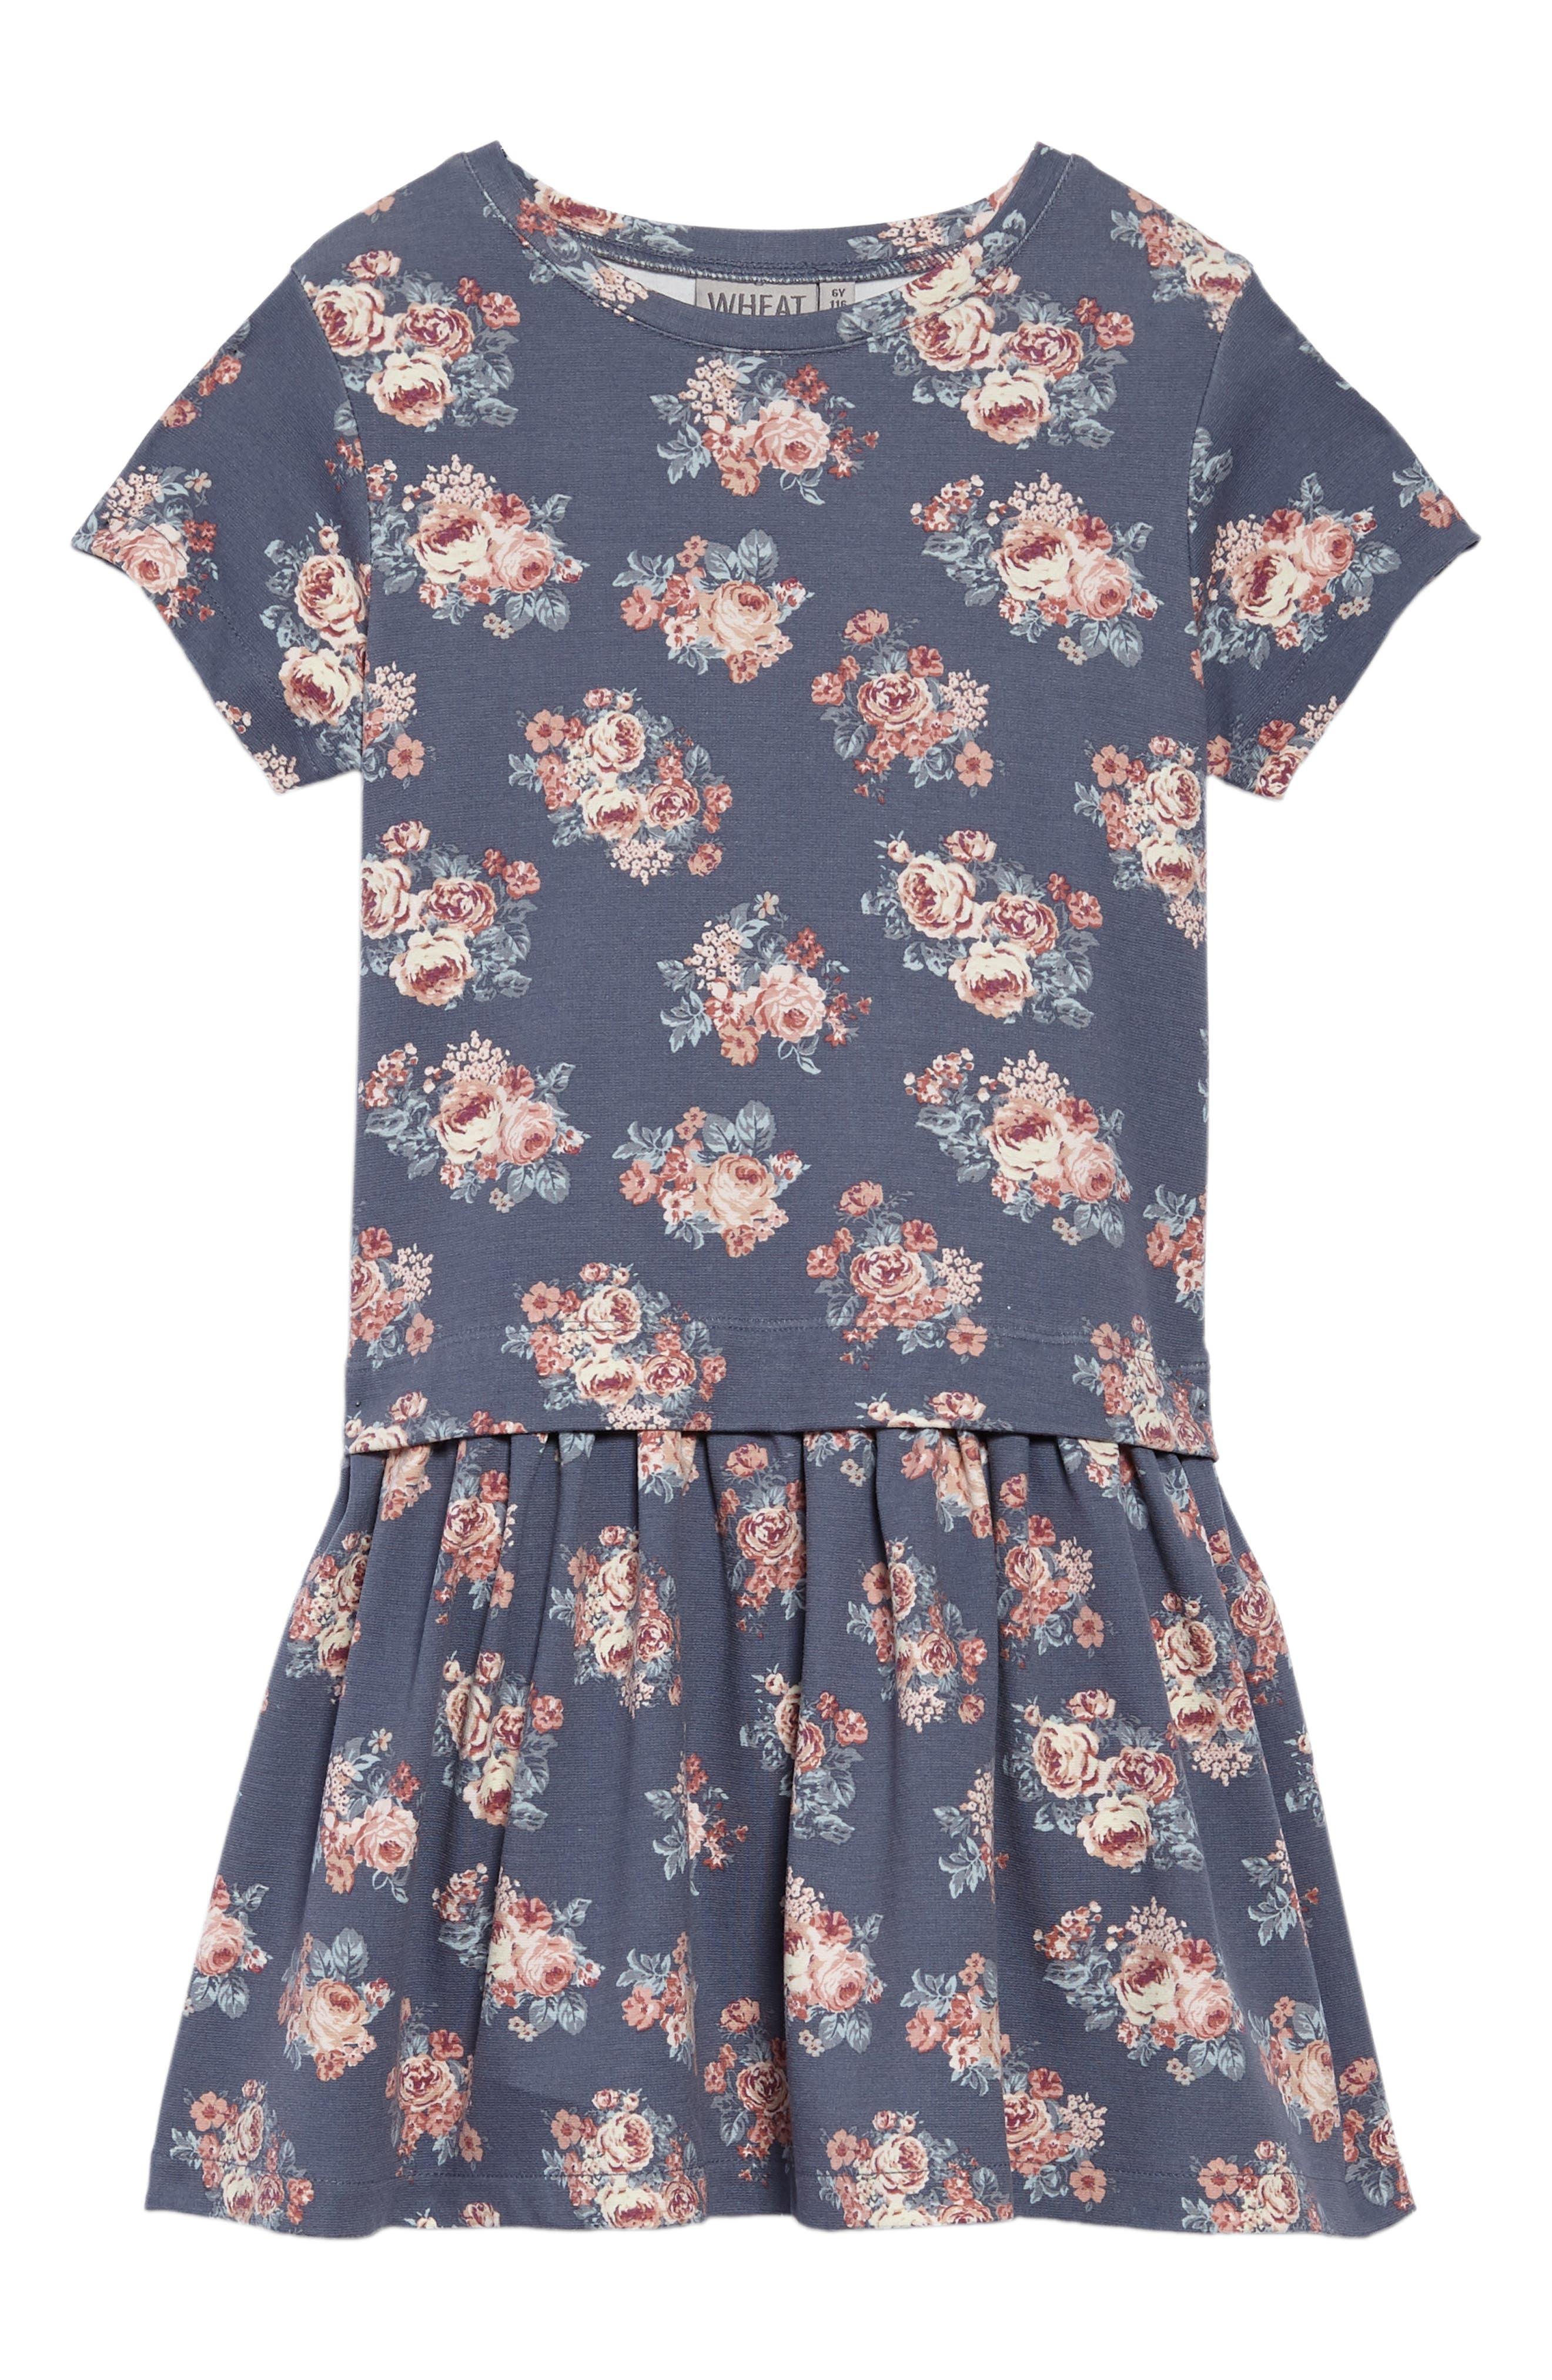 Michella Floral Print Dress,                             Main thumbnail 1, color,                             020